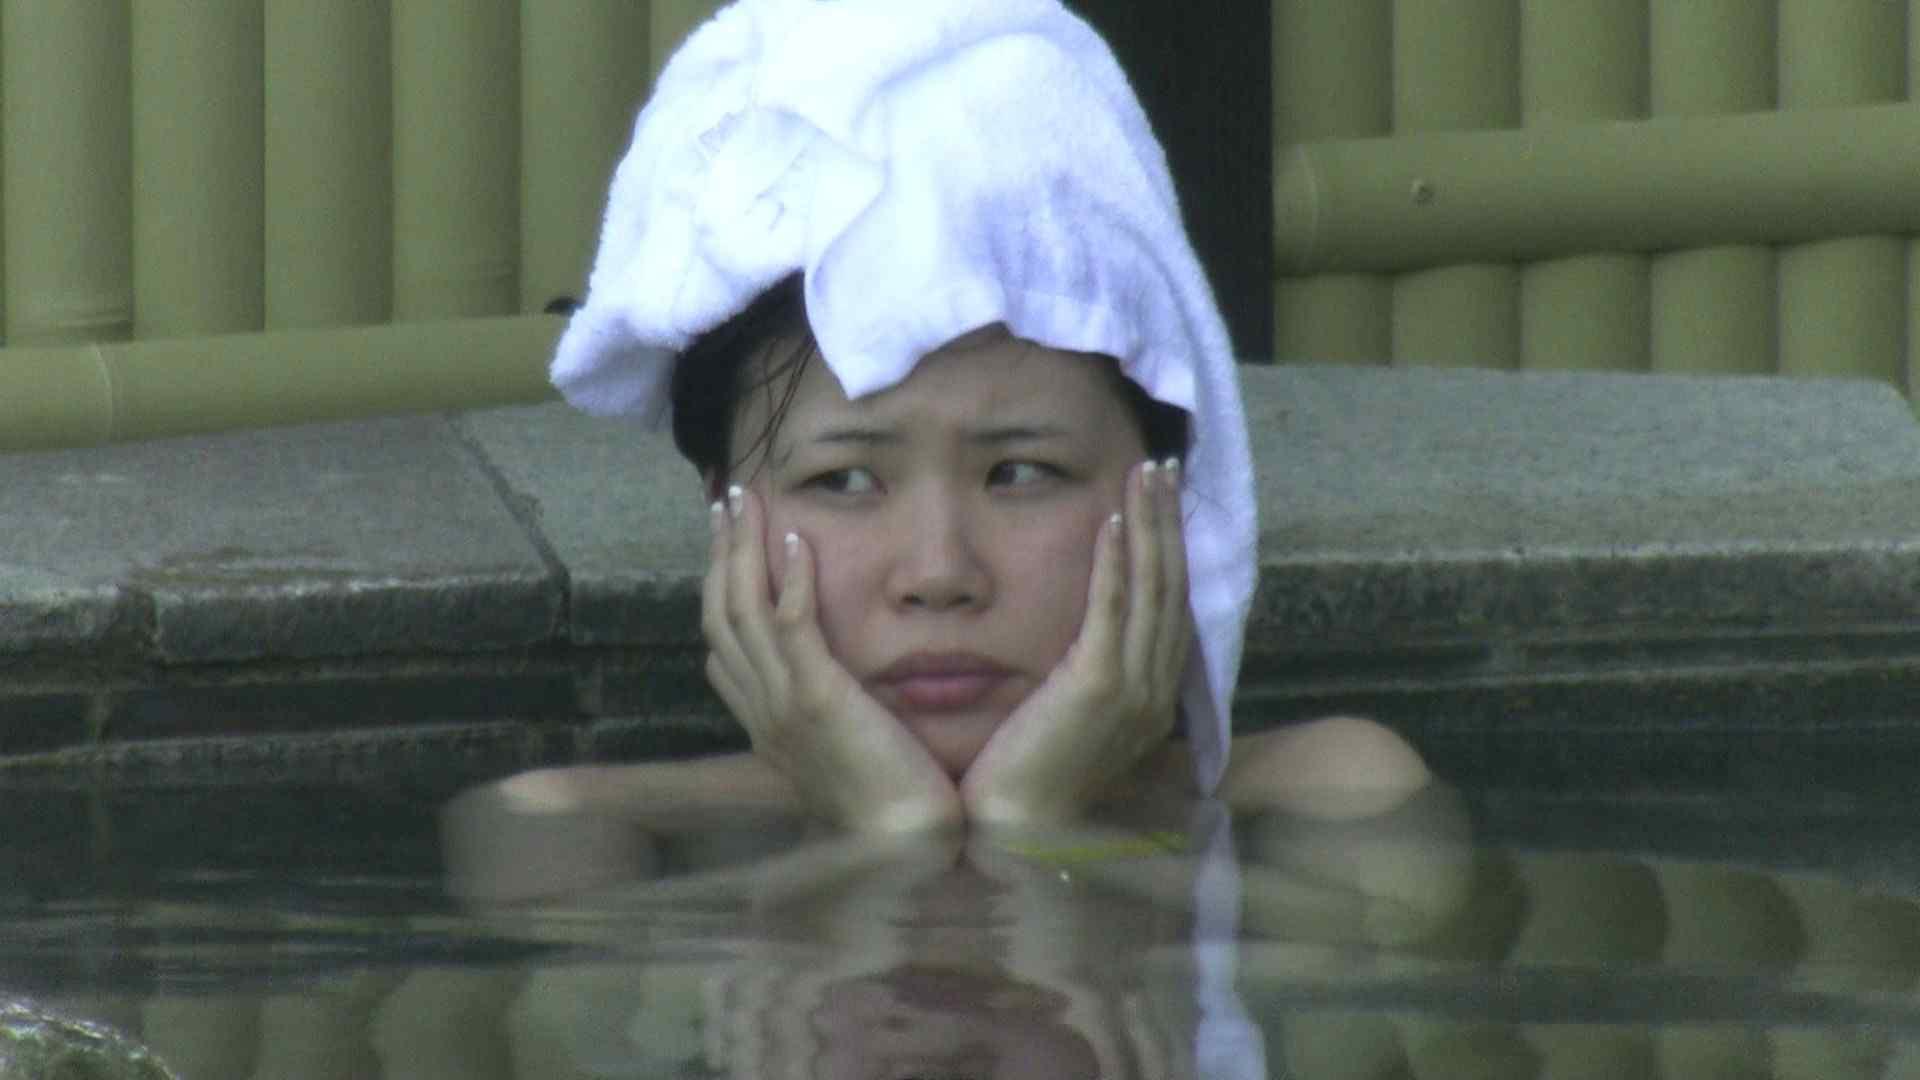 Aquaな露天風呂Vol.183 露天風呂編  104PIX 102